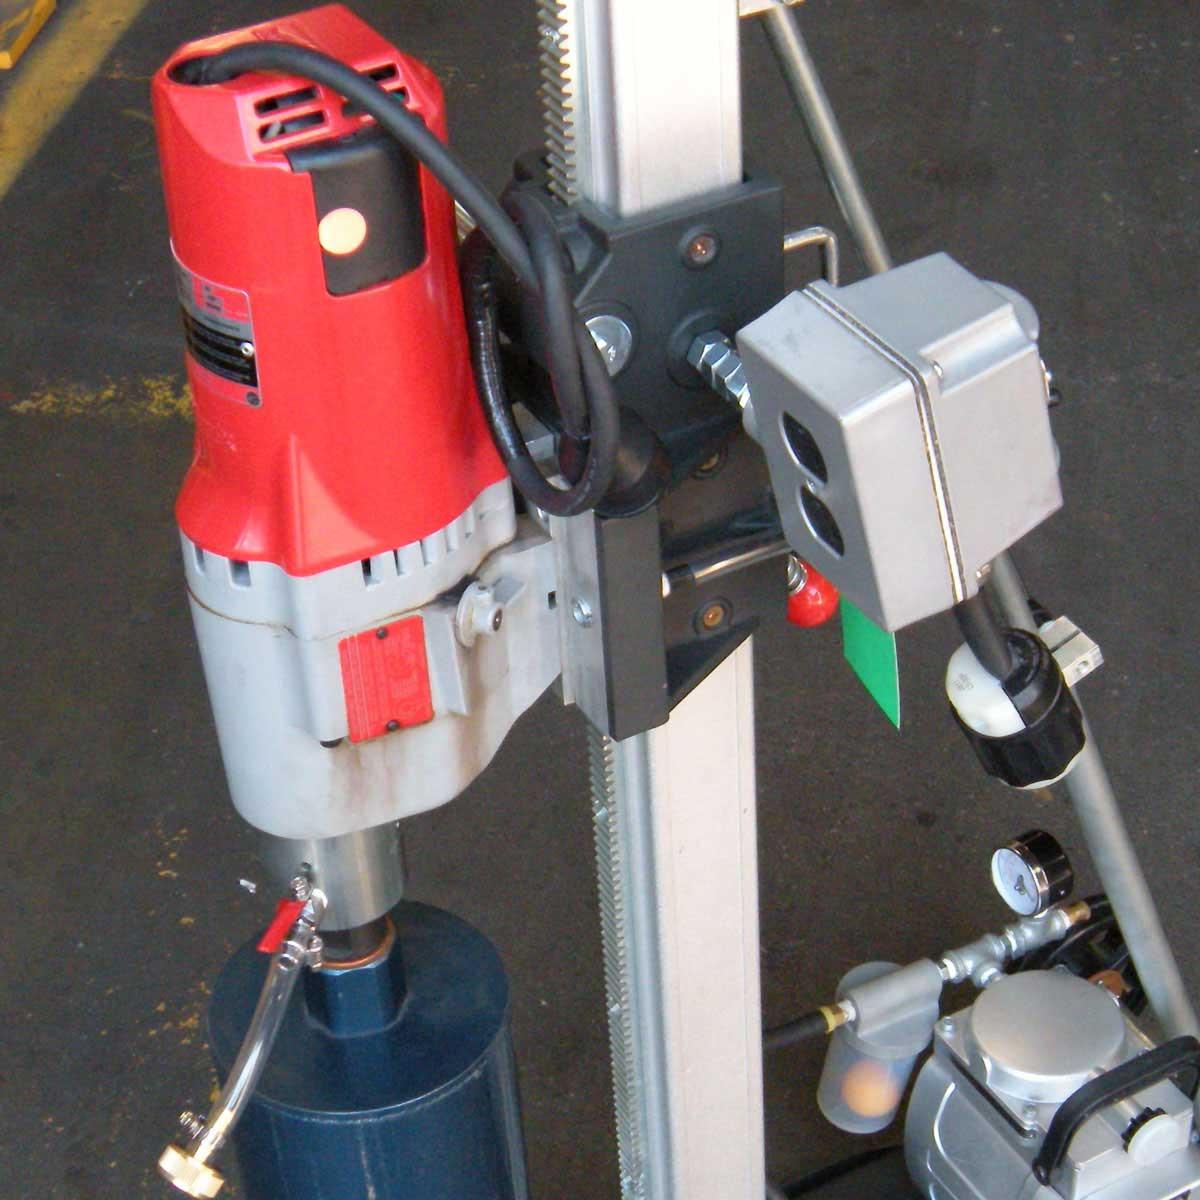 Milwaukee 4096 Motor stand mounted